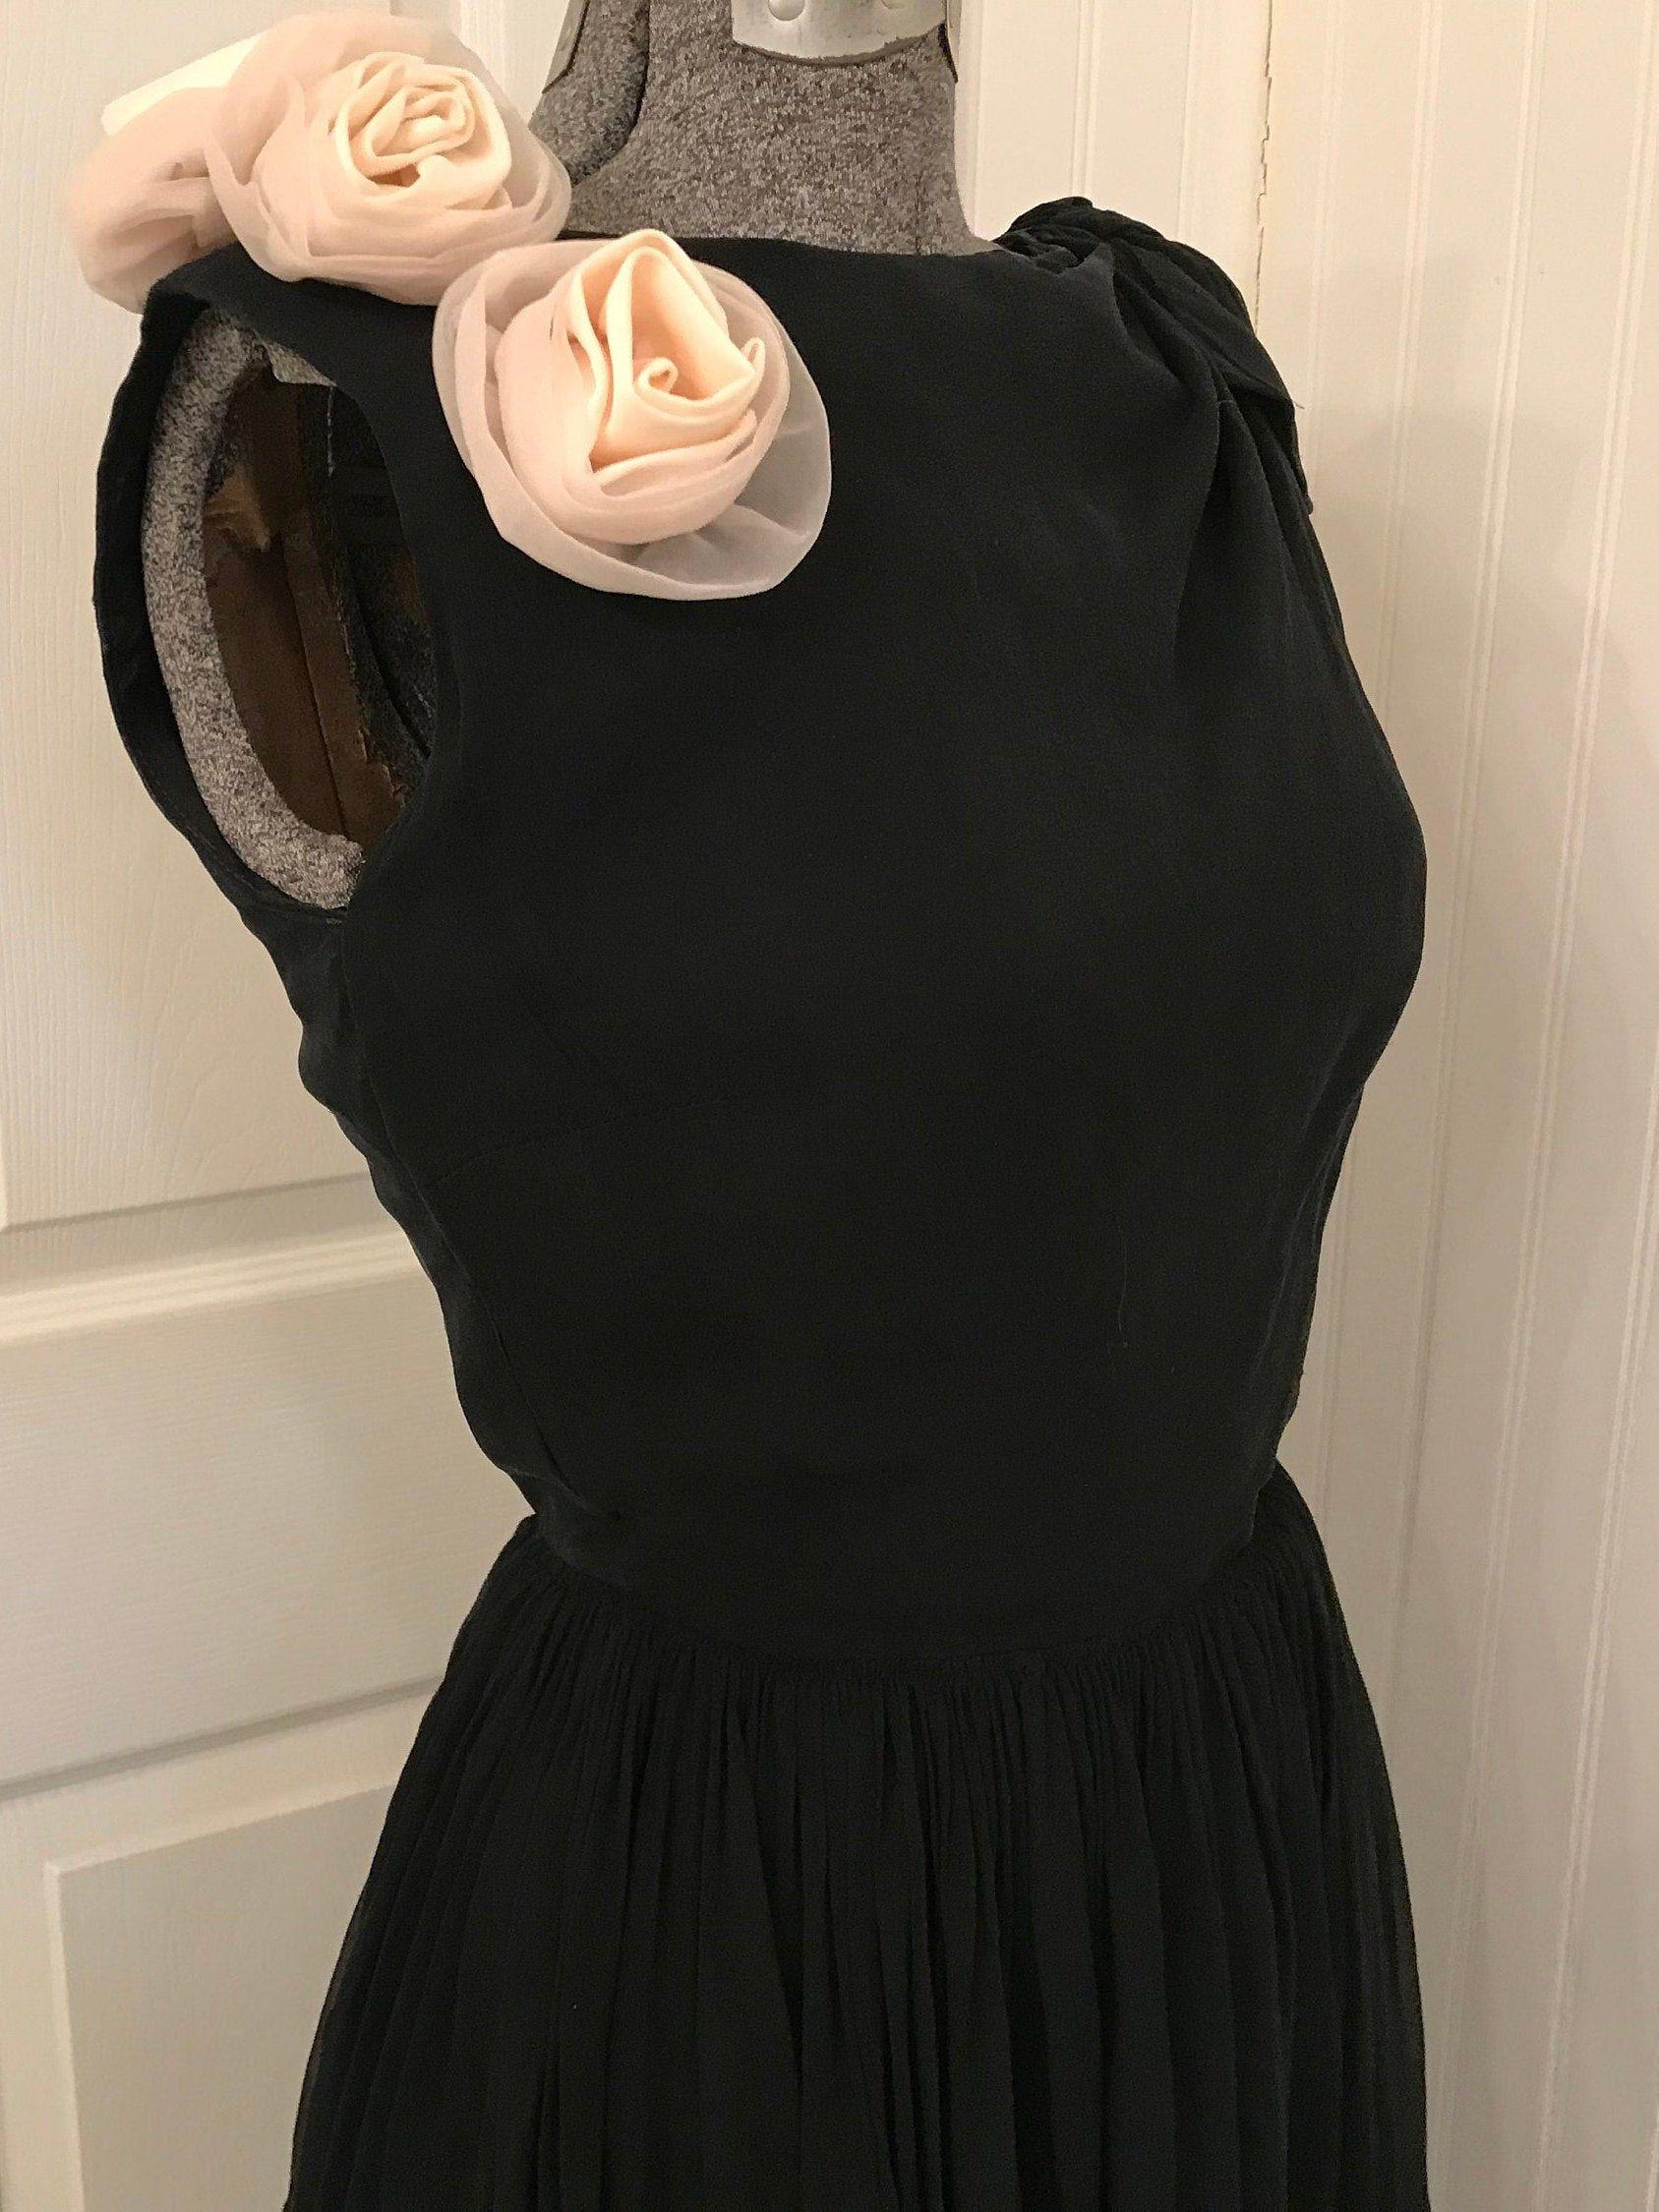 Vintage 1950 S Black Party Dress Chiffon White Flowers Black Bow B 32 By Hatmvintage On Etsy Black Party Dresses Vintage 1950s Dresses Dresses [ 2250 x 1687 Pixel ]